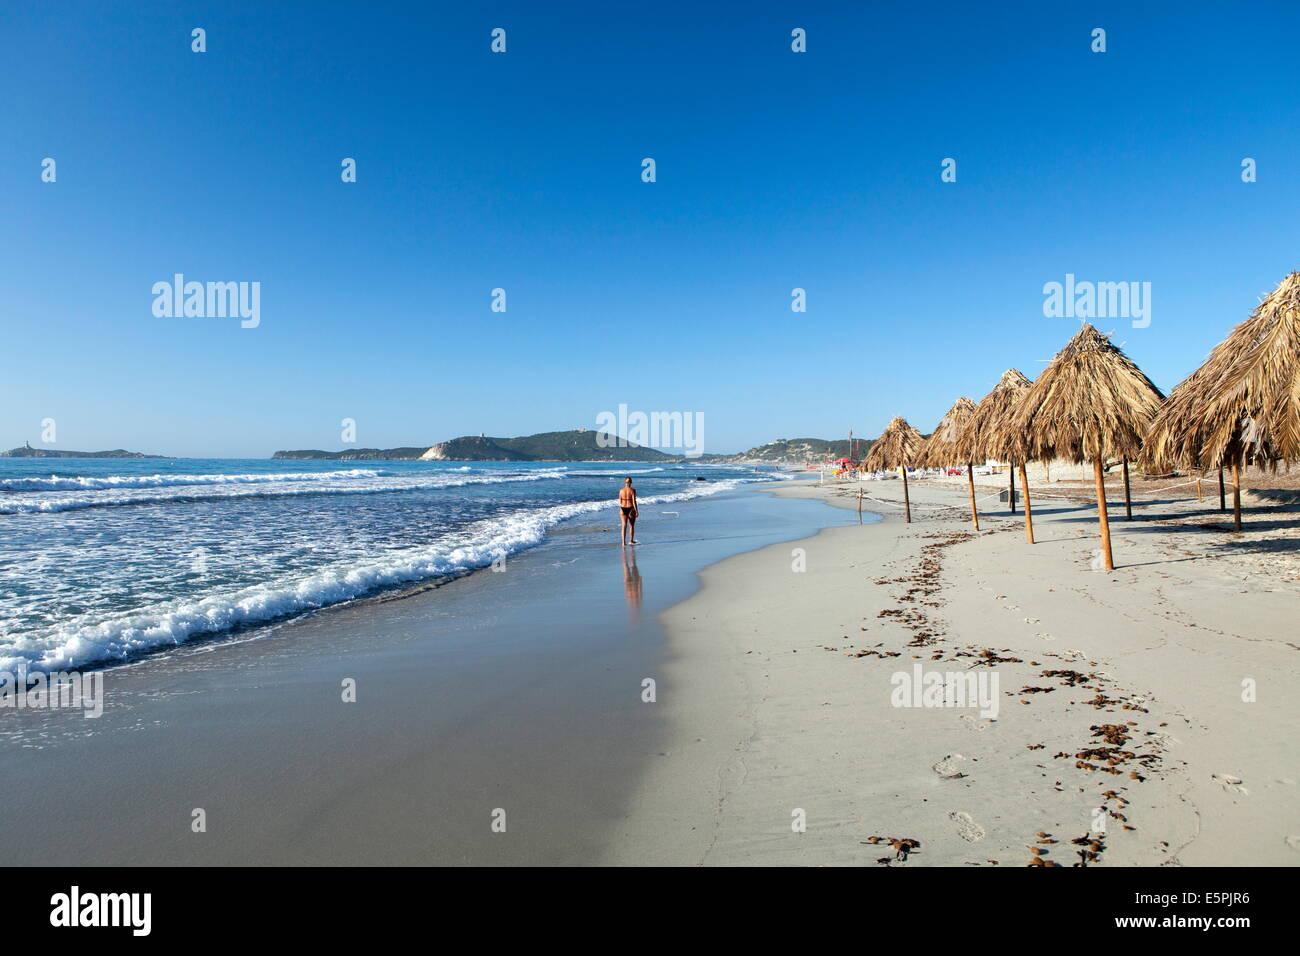 Villasimius Beach, Cagliari Province, Sardinia, Italy, Mediterranean, Europe Stock Photo